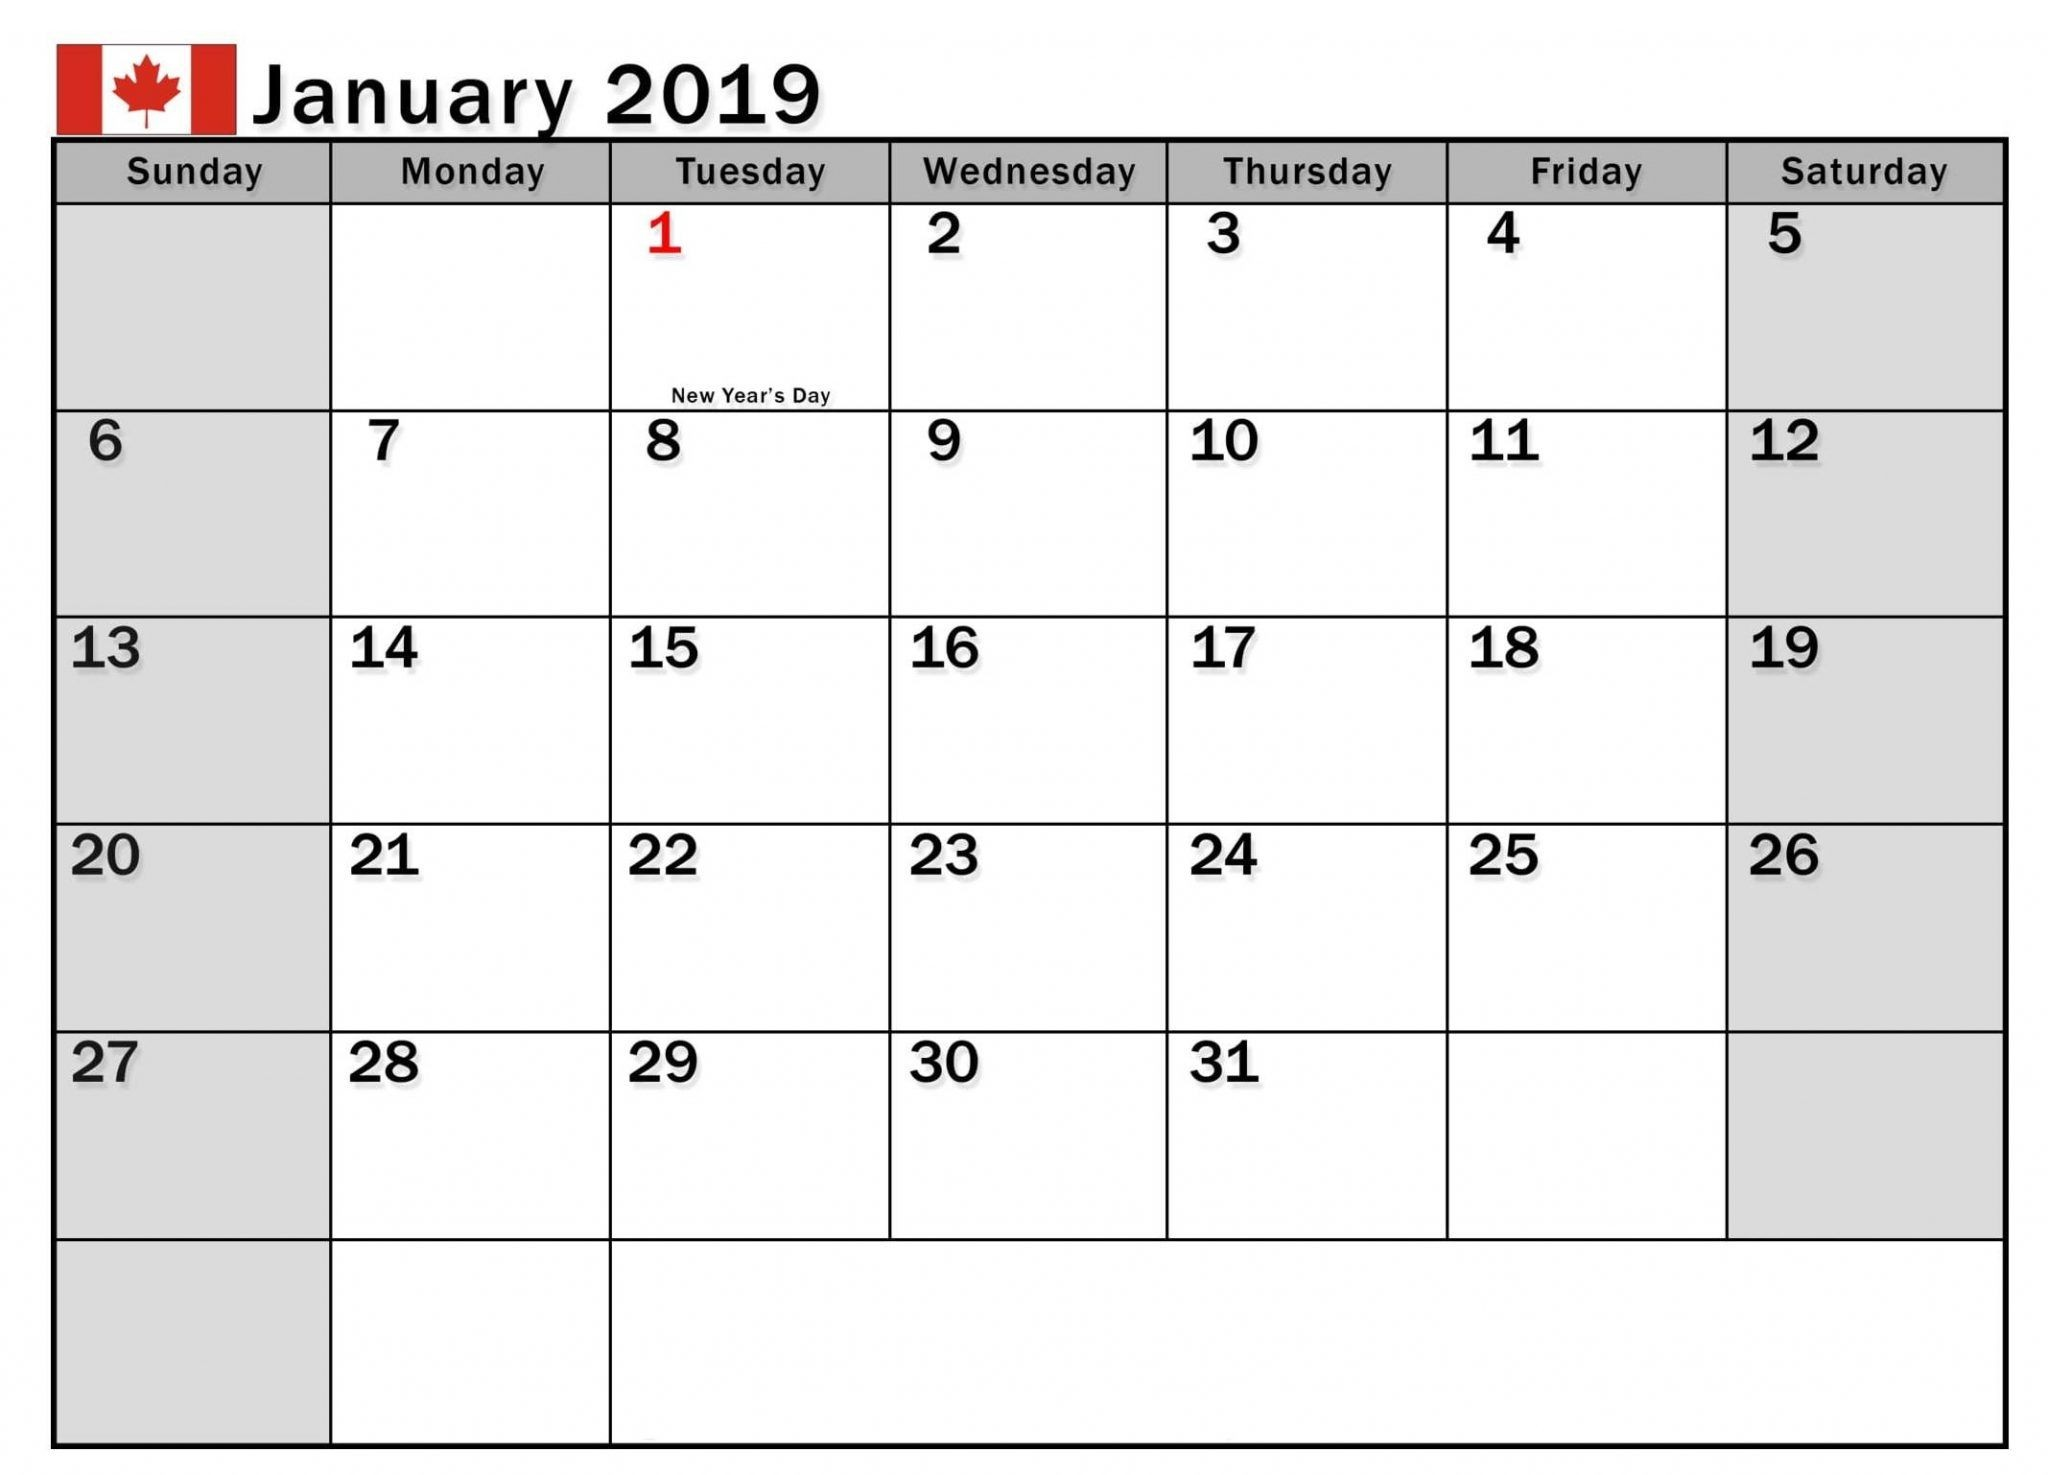 March Calendar Canada Recientes January 2019 Calendars Canada Lara Expolicenciaslatam Of March Calendar Canada Más Arriba-a-fecha Kalender Ausdrucken 2015 Schön Printable 0d Calendars Kalender